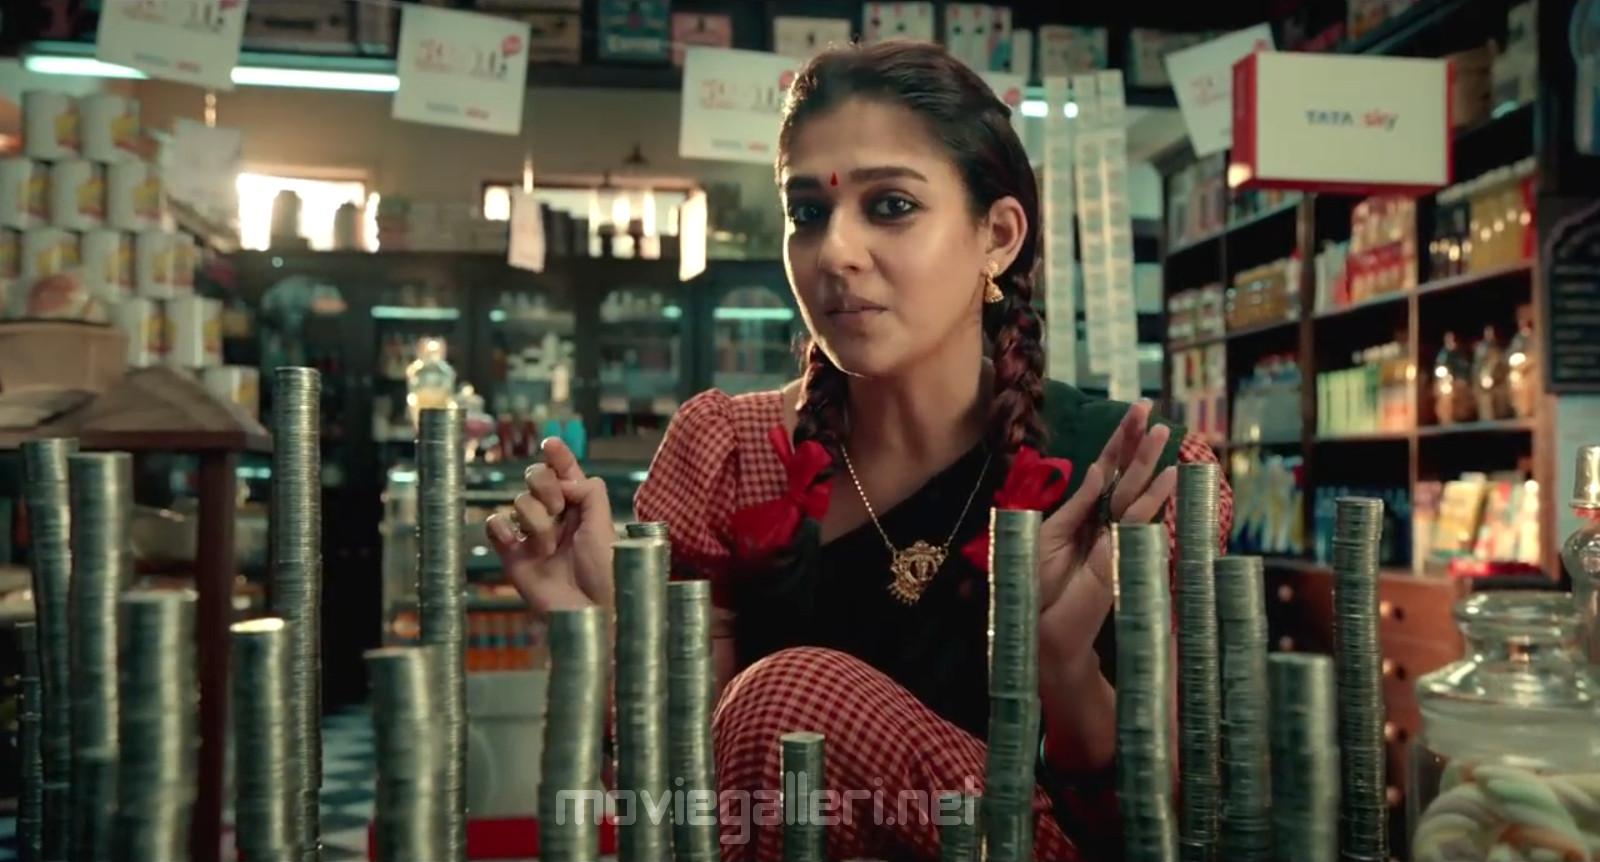 Actress Nayanthara in Tatasky Ad